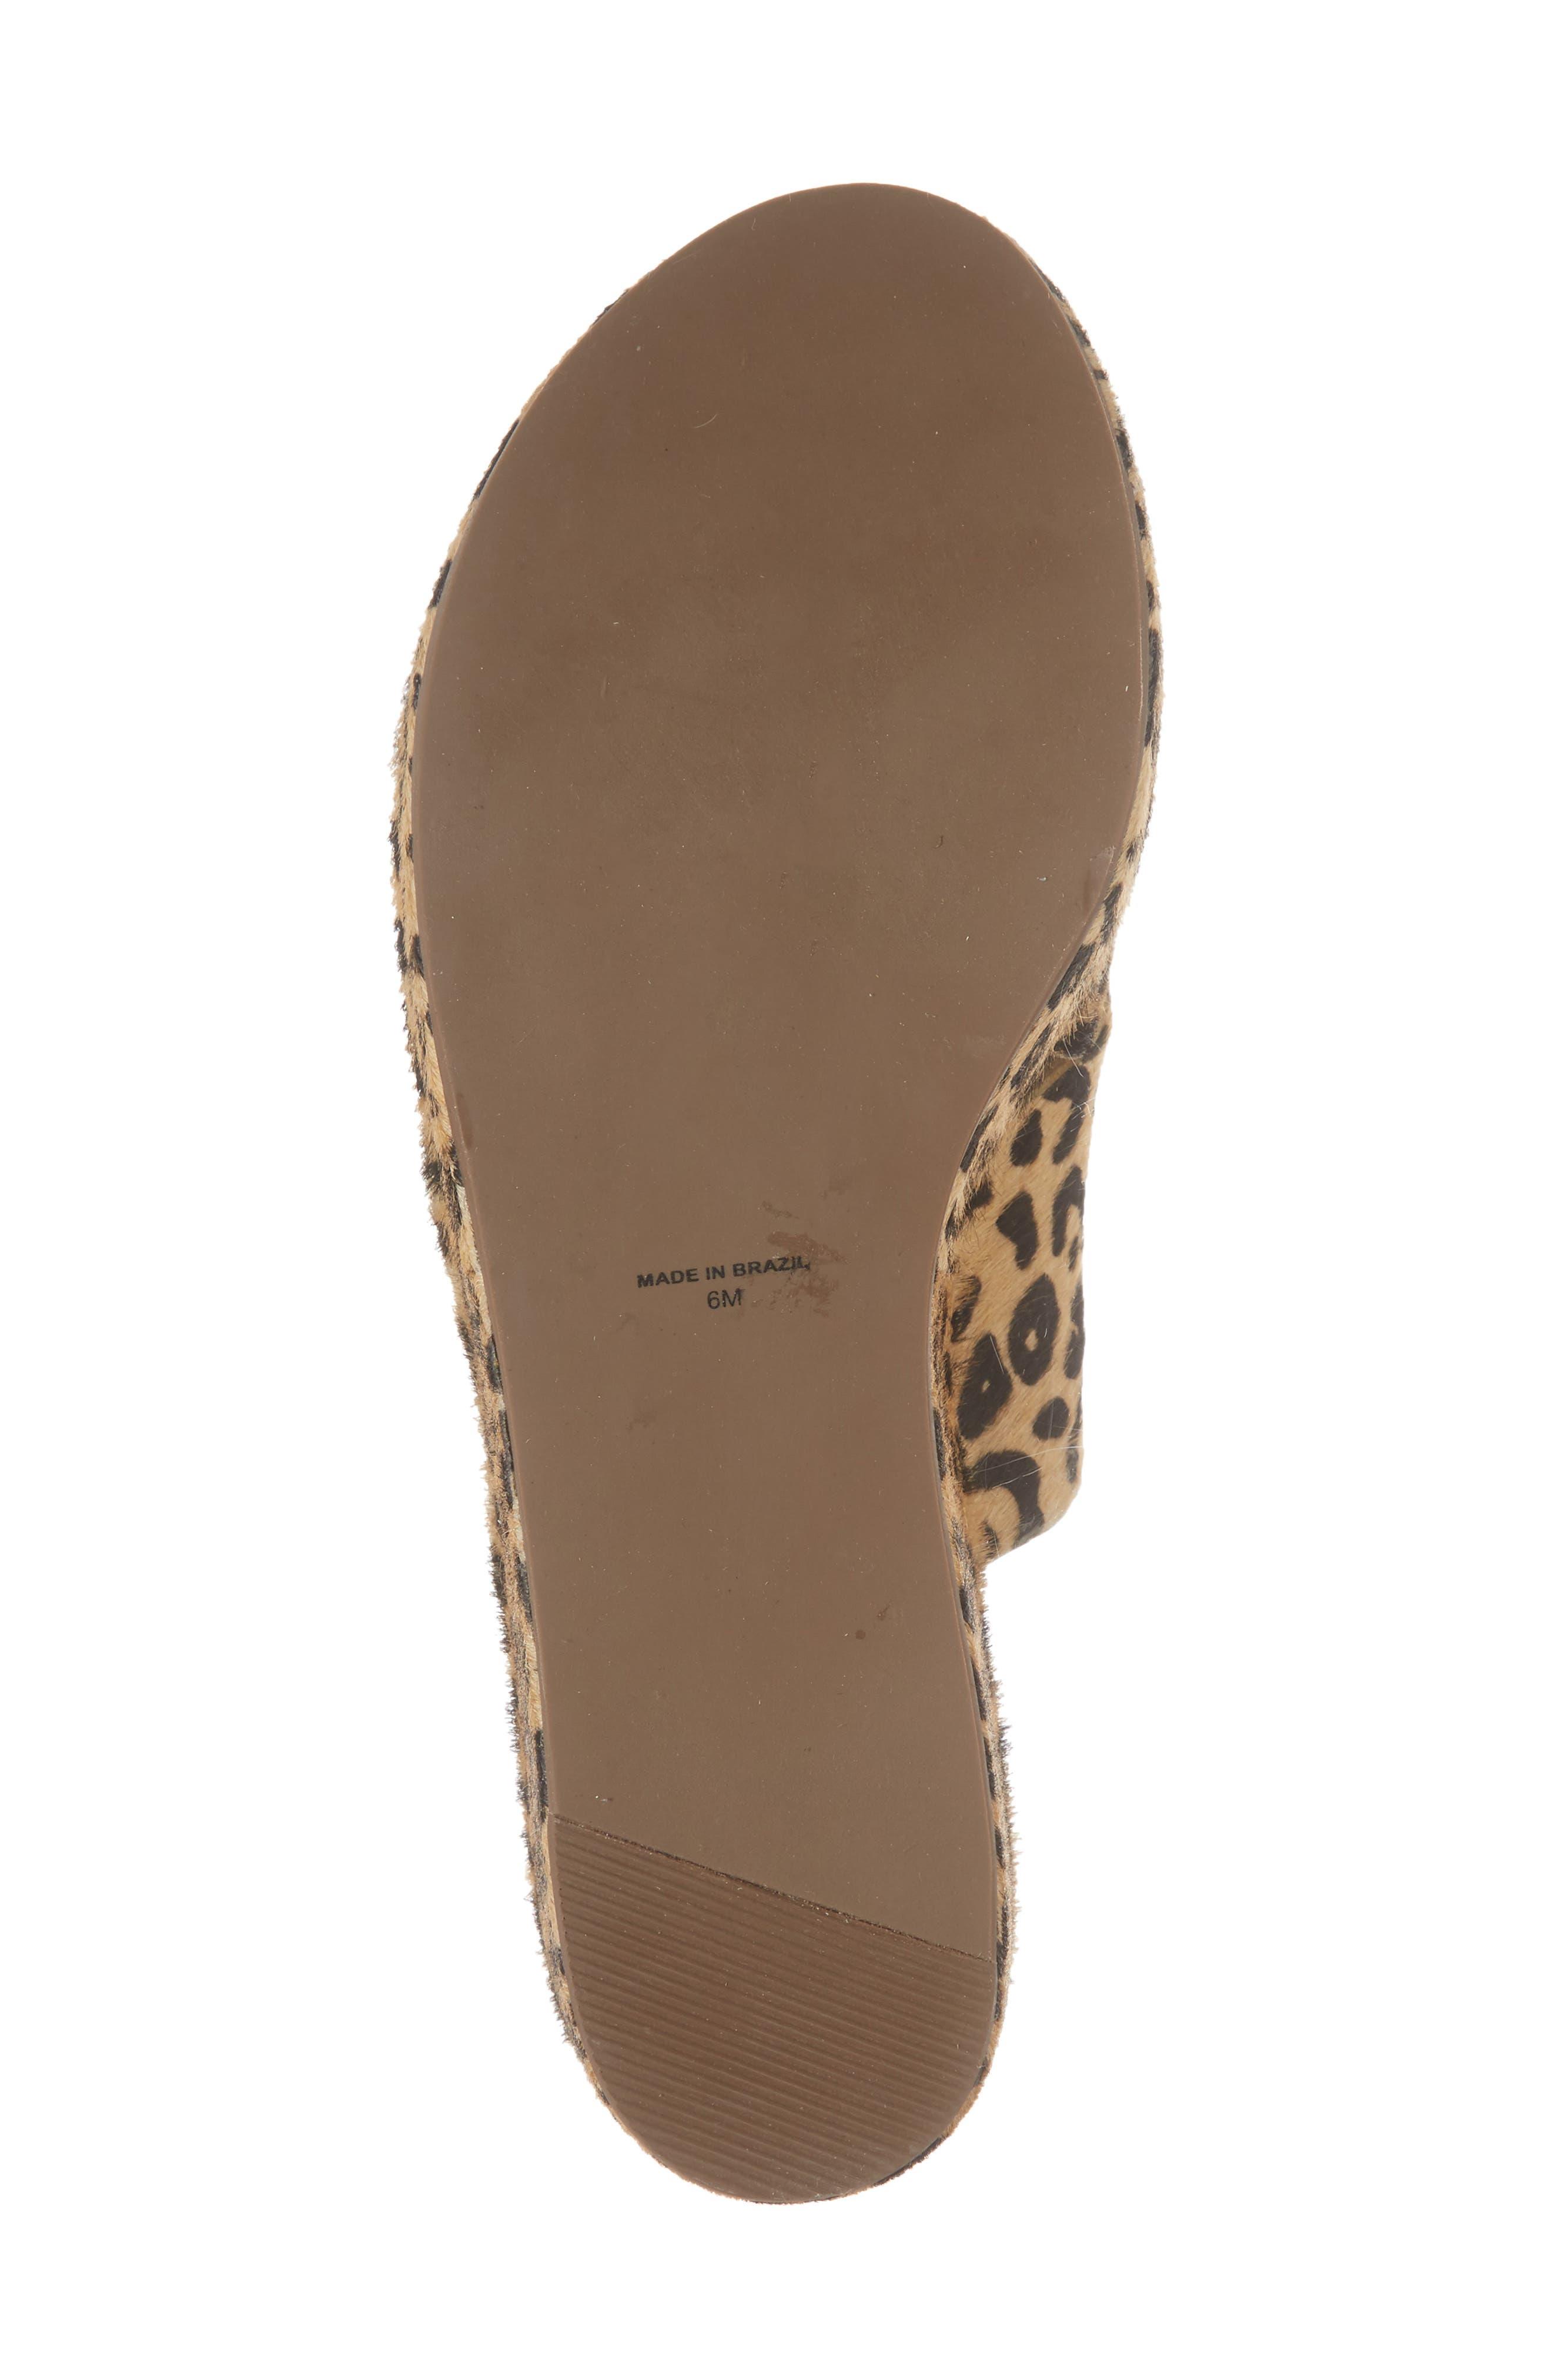 Runway Wedge Sandal,                             Alternate thumbnail 6, color,                             Leopard Calf Hair